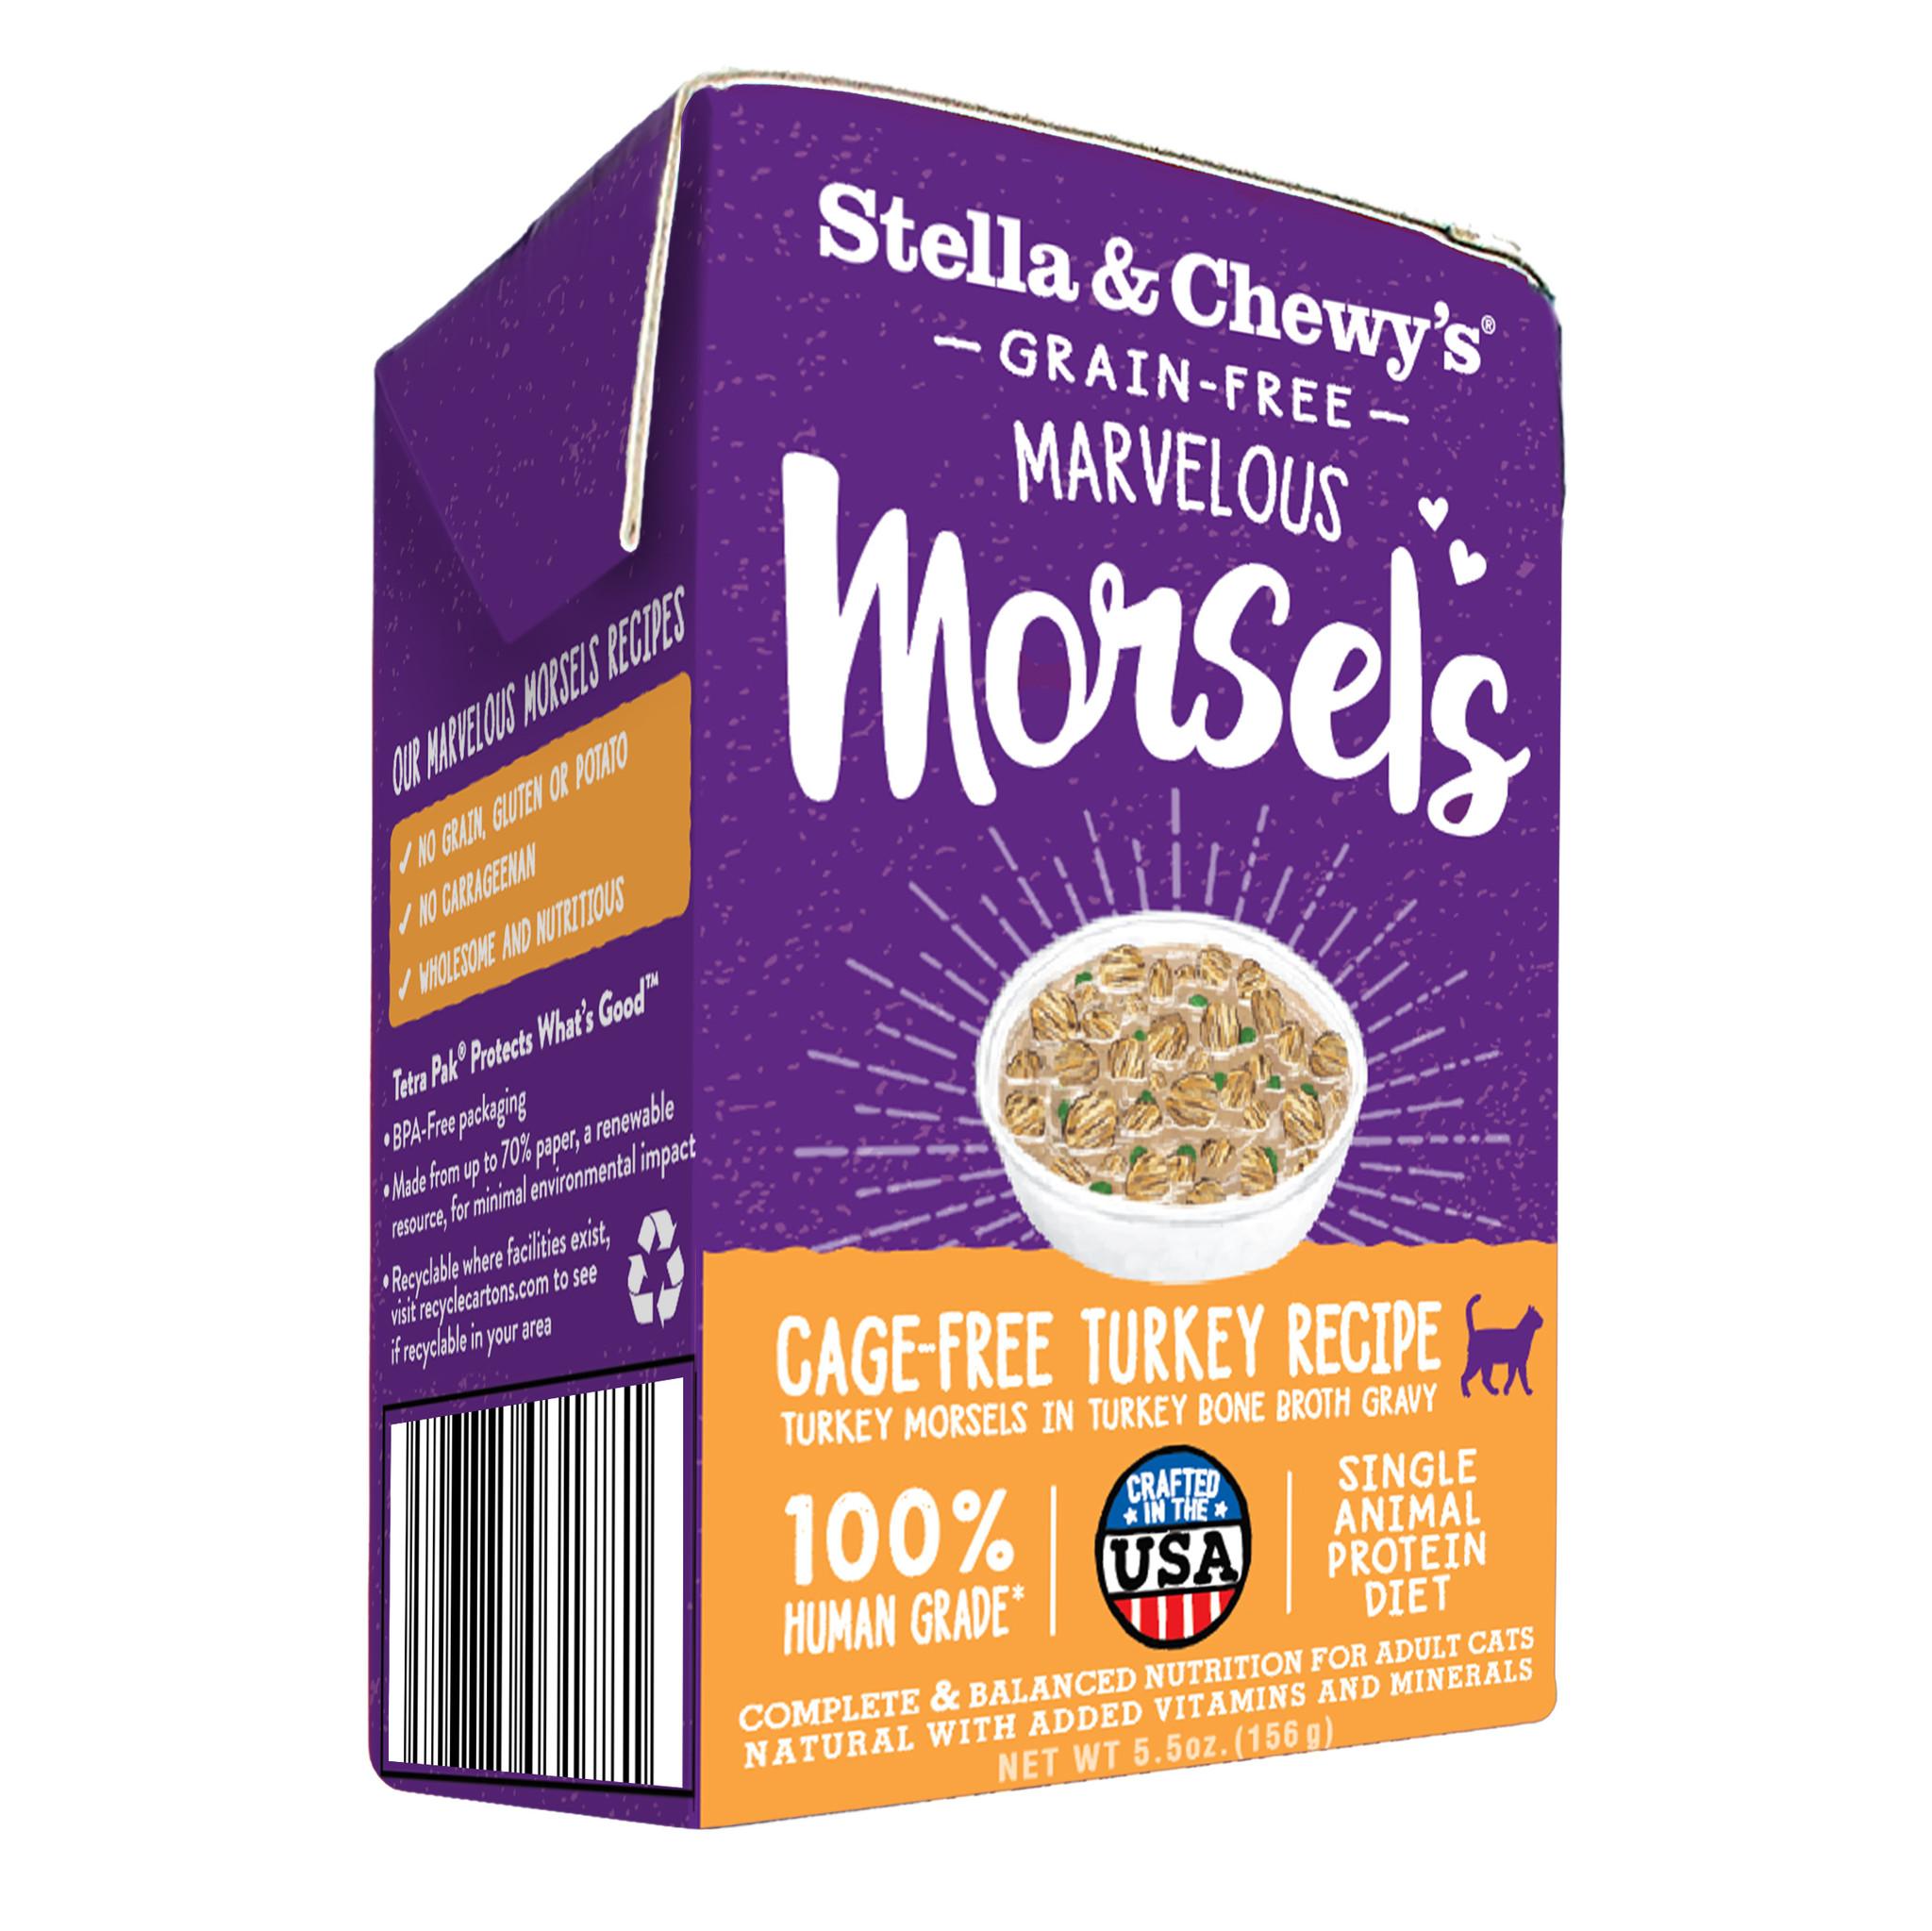 Stella & Chewys Stella & Chewys Marvelous Morsels Cage Free Turkey Recipe